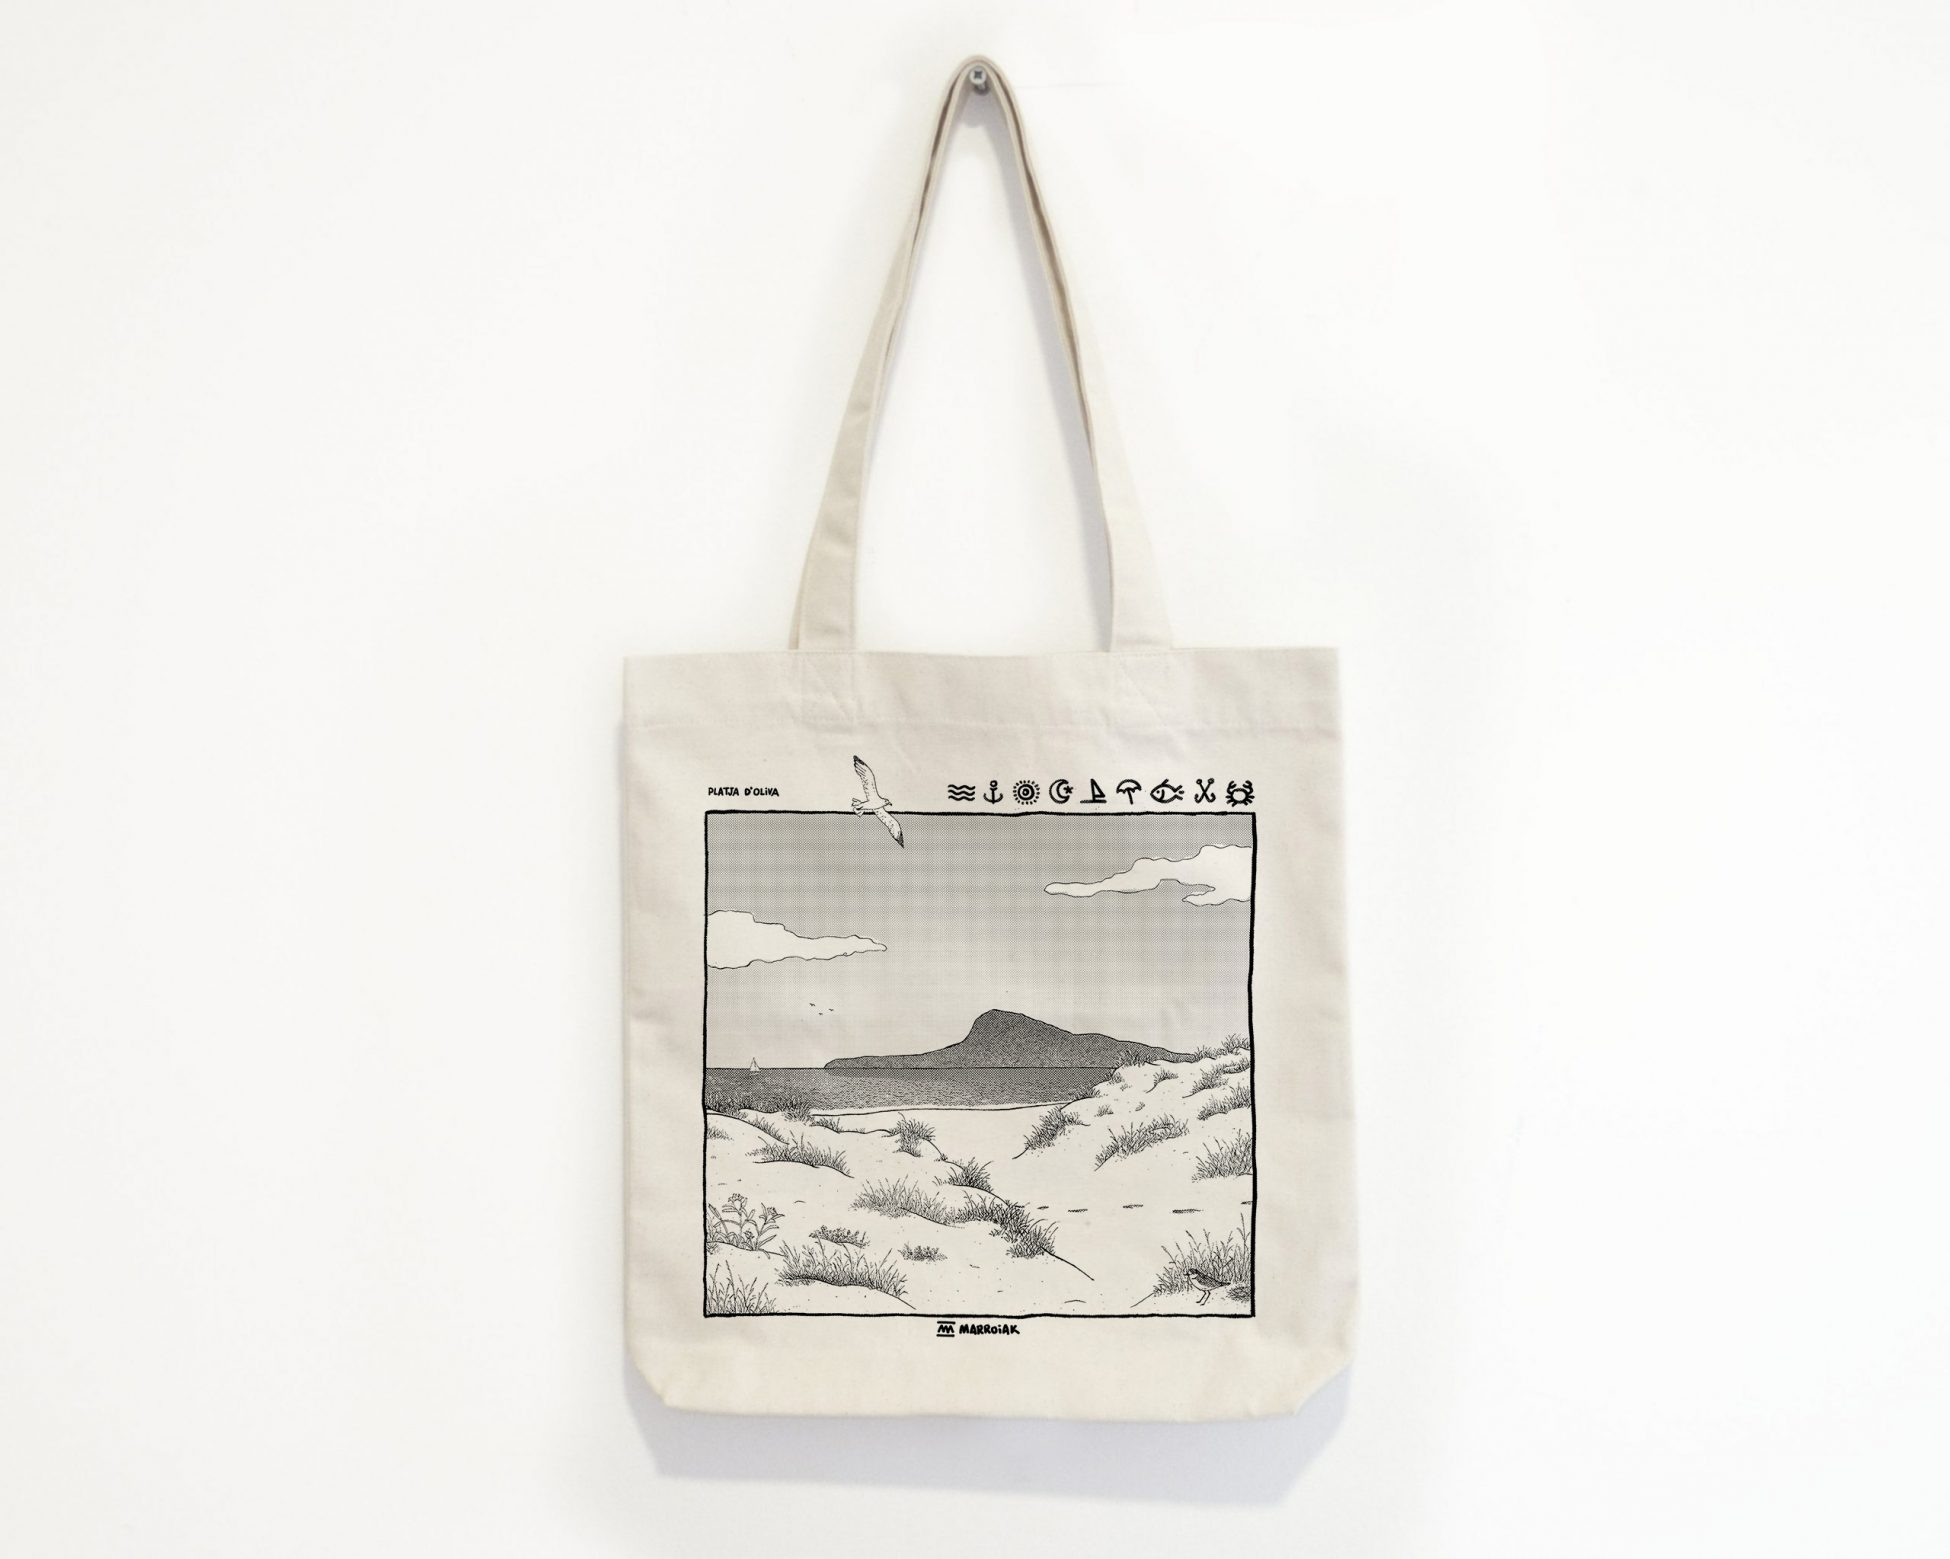 Bolsa de tela con una ilustración de la platja d´Oliva en La Safor. Dibujo en blanco y negro serigrafia